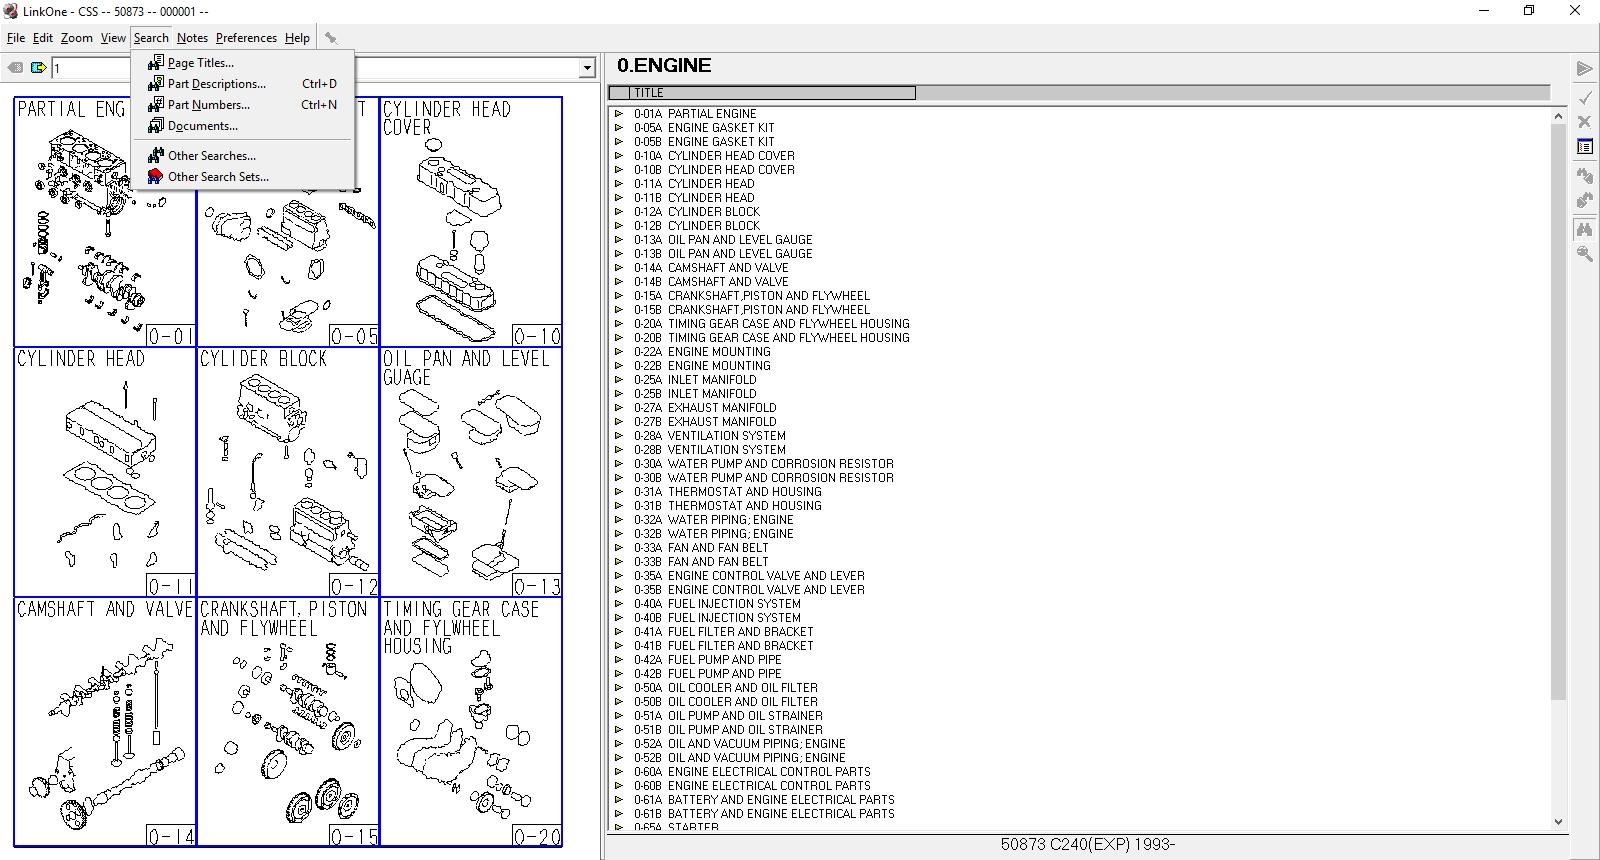 ISUZU_CSS-NET_EPC_052020_Electronic_Parts_Catalog_7